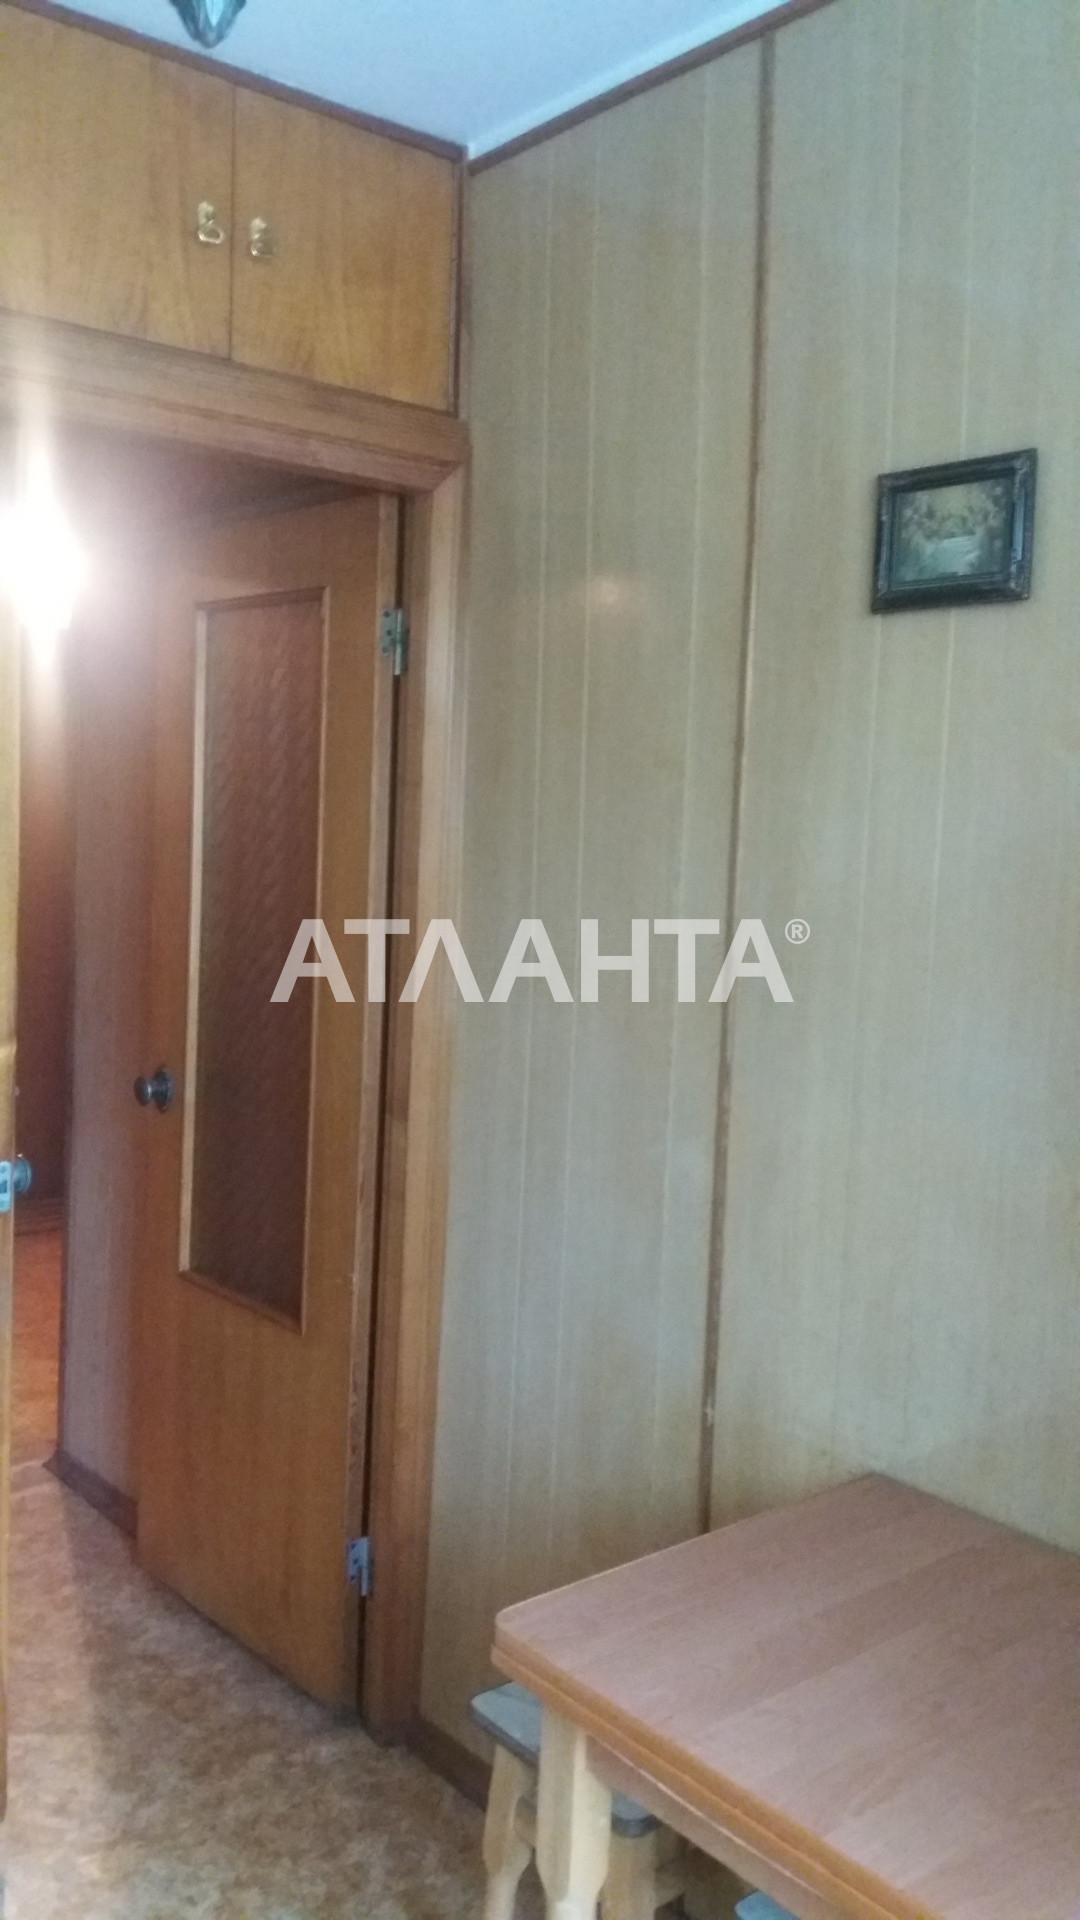 Продается 1-комнатная Квартира на ул. Александрийская — 29 000 у.е. (фото №7)